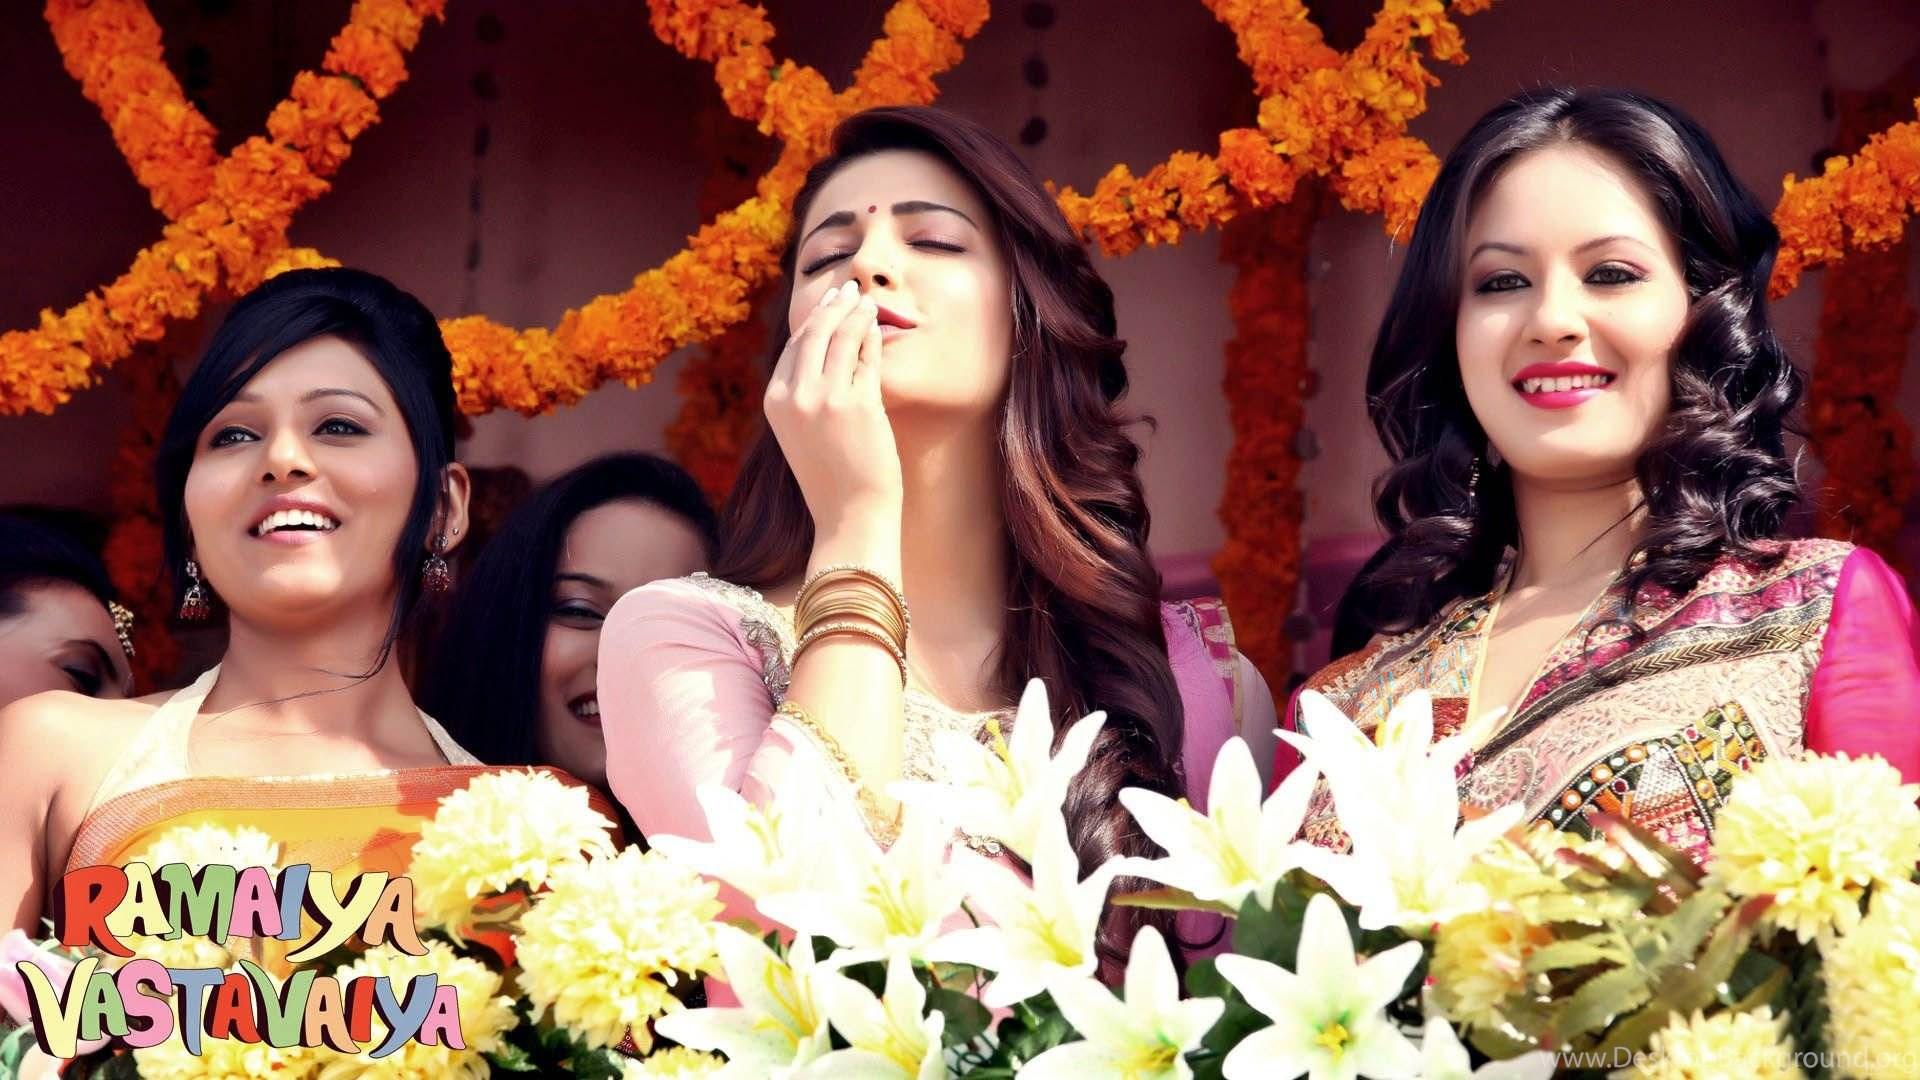 bollywood movie ramaiya vastavaiya heroines hd wallpapers desktop